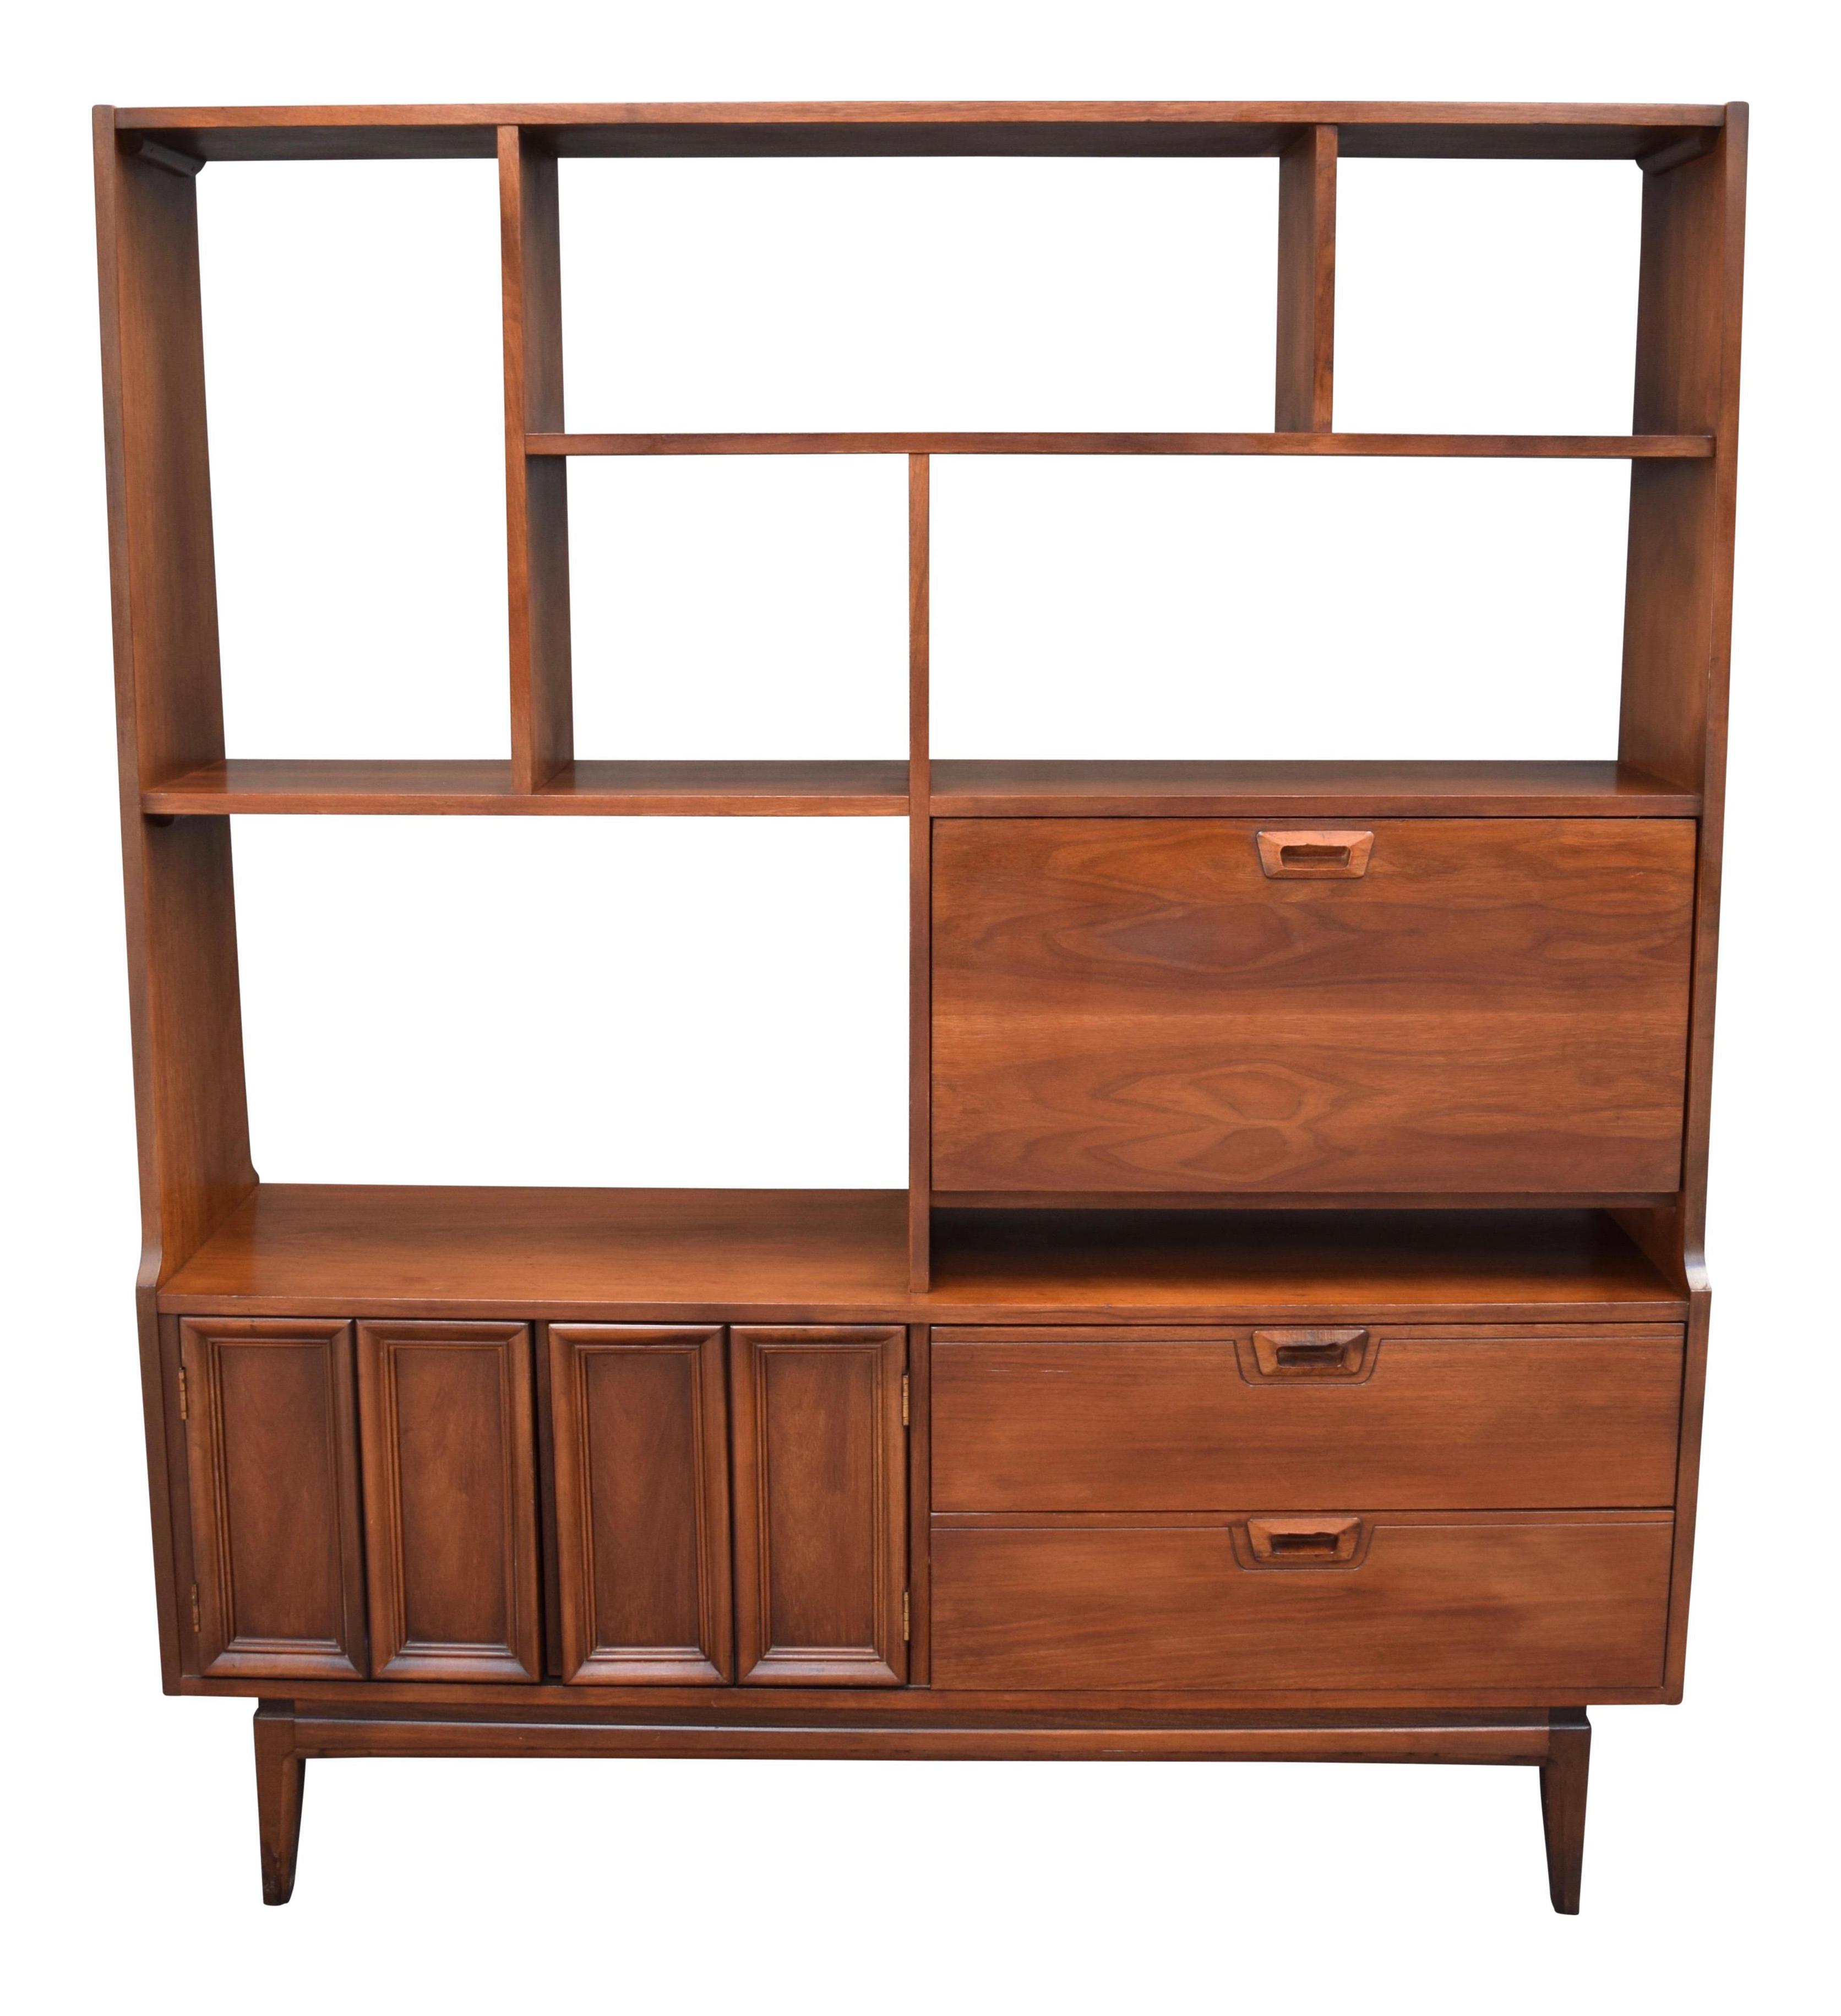 Vintage Mid Century Modern Walnut Bookshelf Cabinet Room Divider